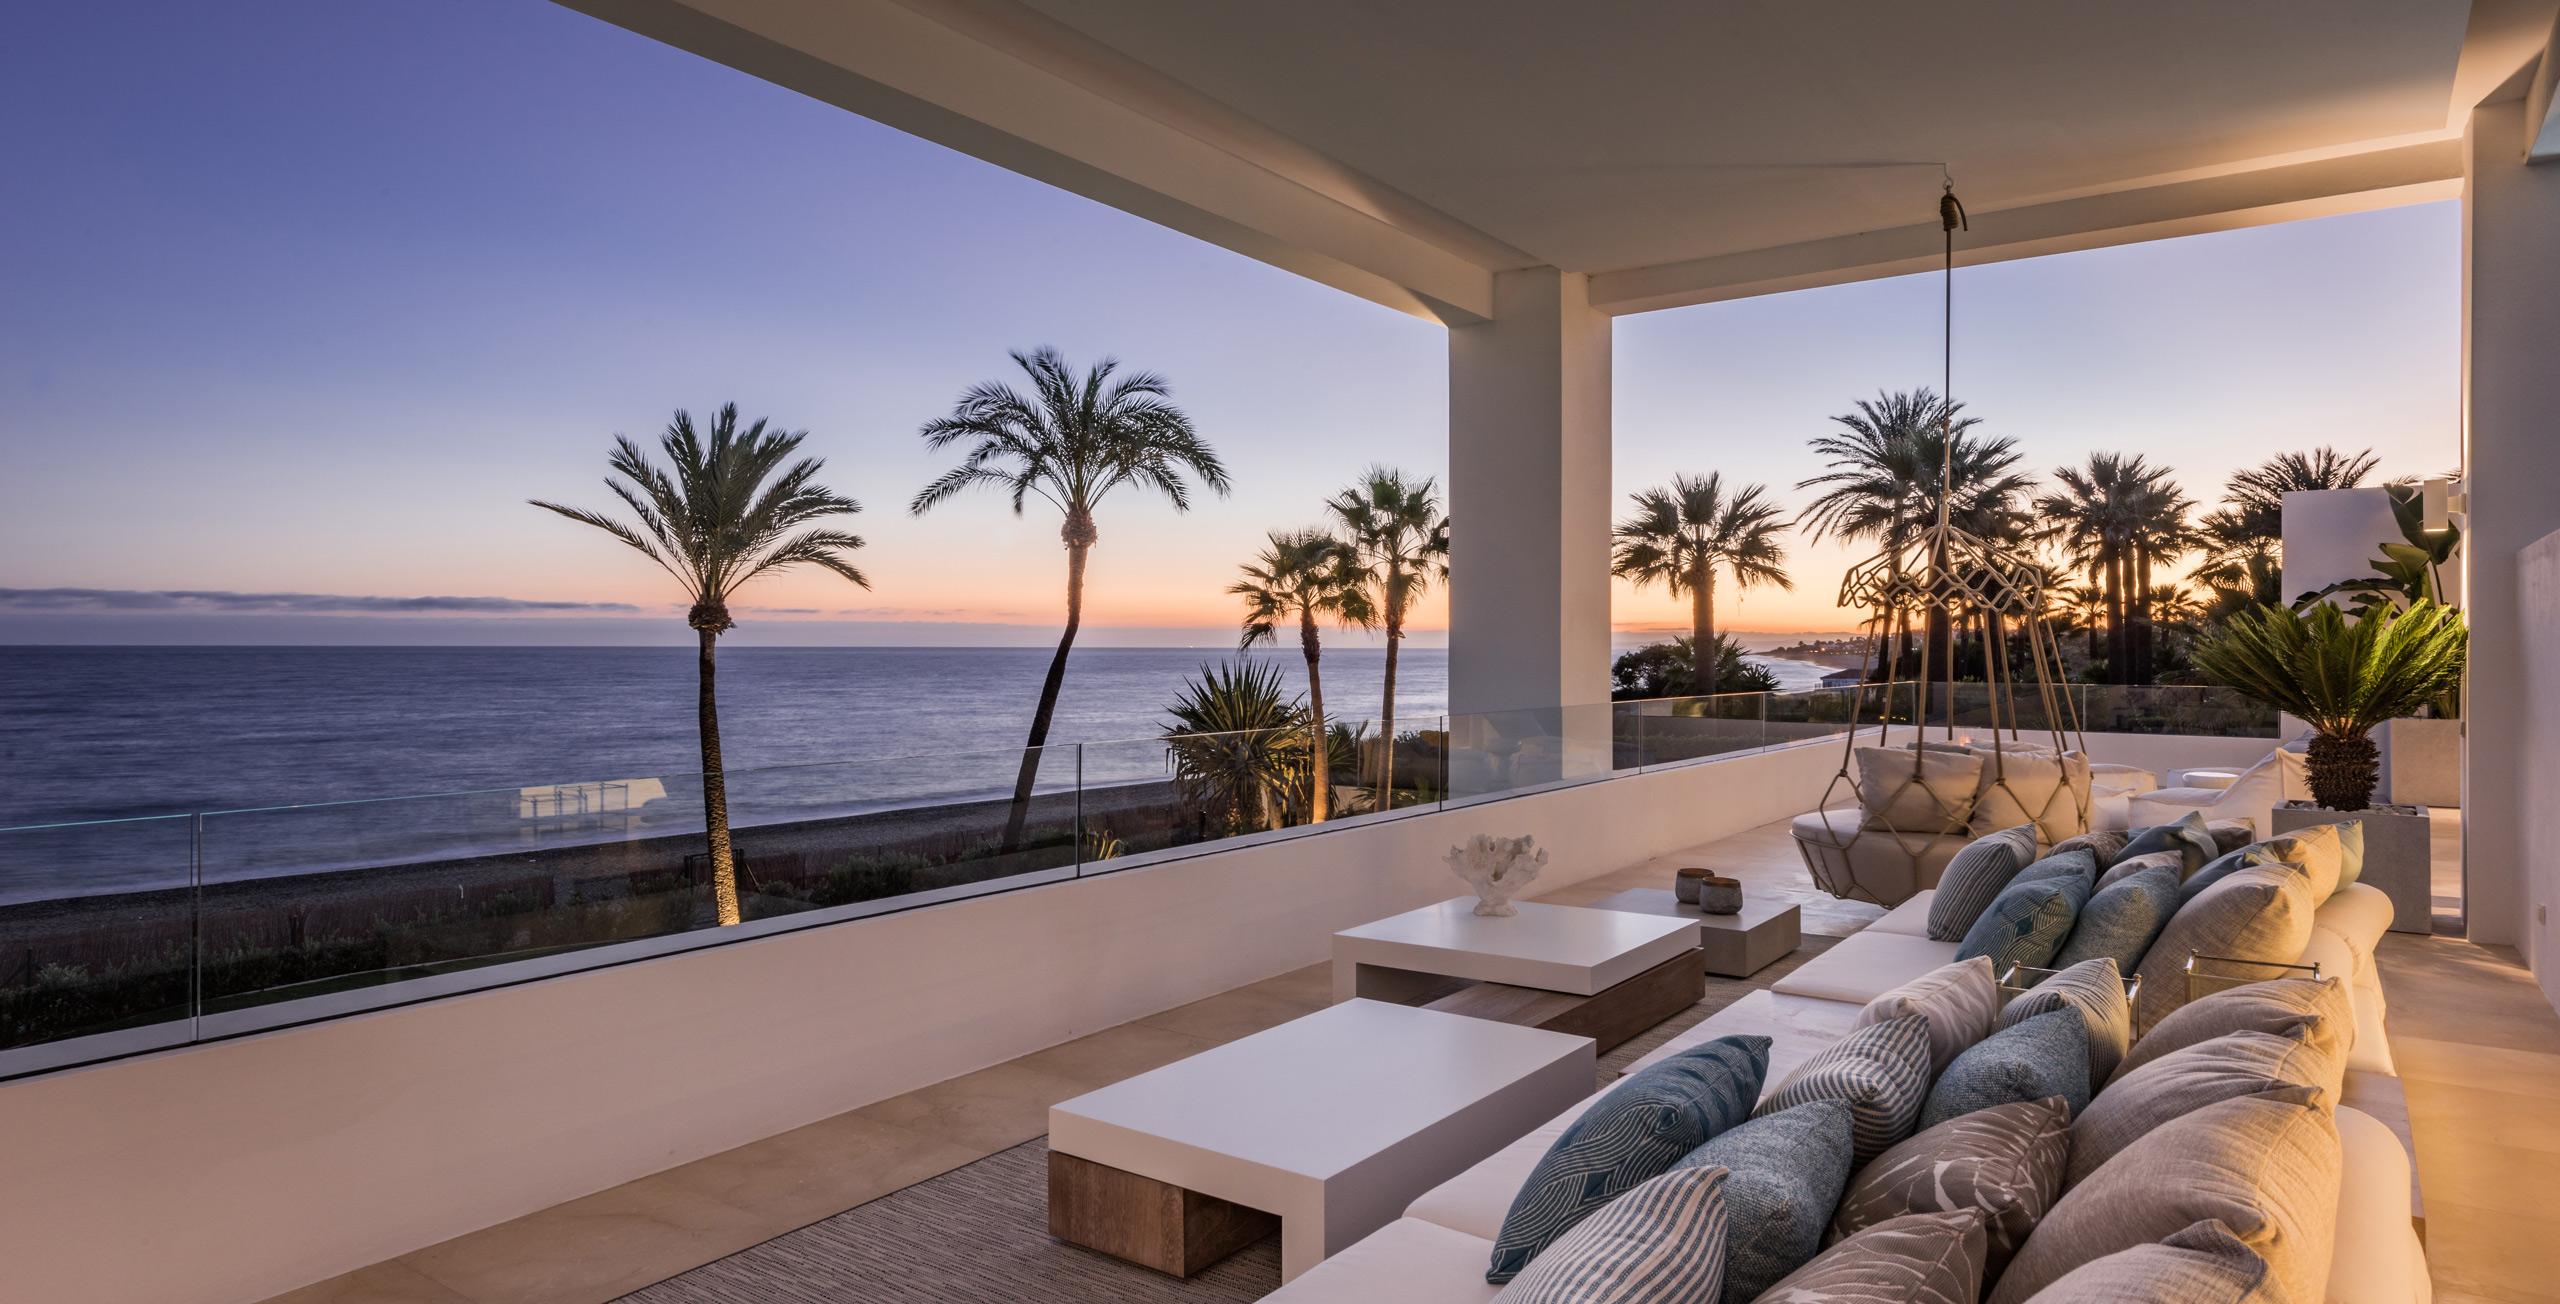 La-perla-blanca-luxury-mansion-marbella